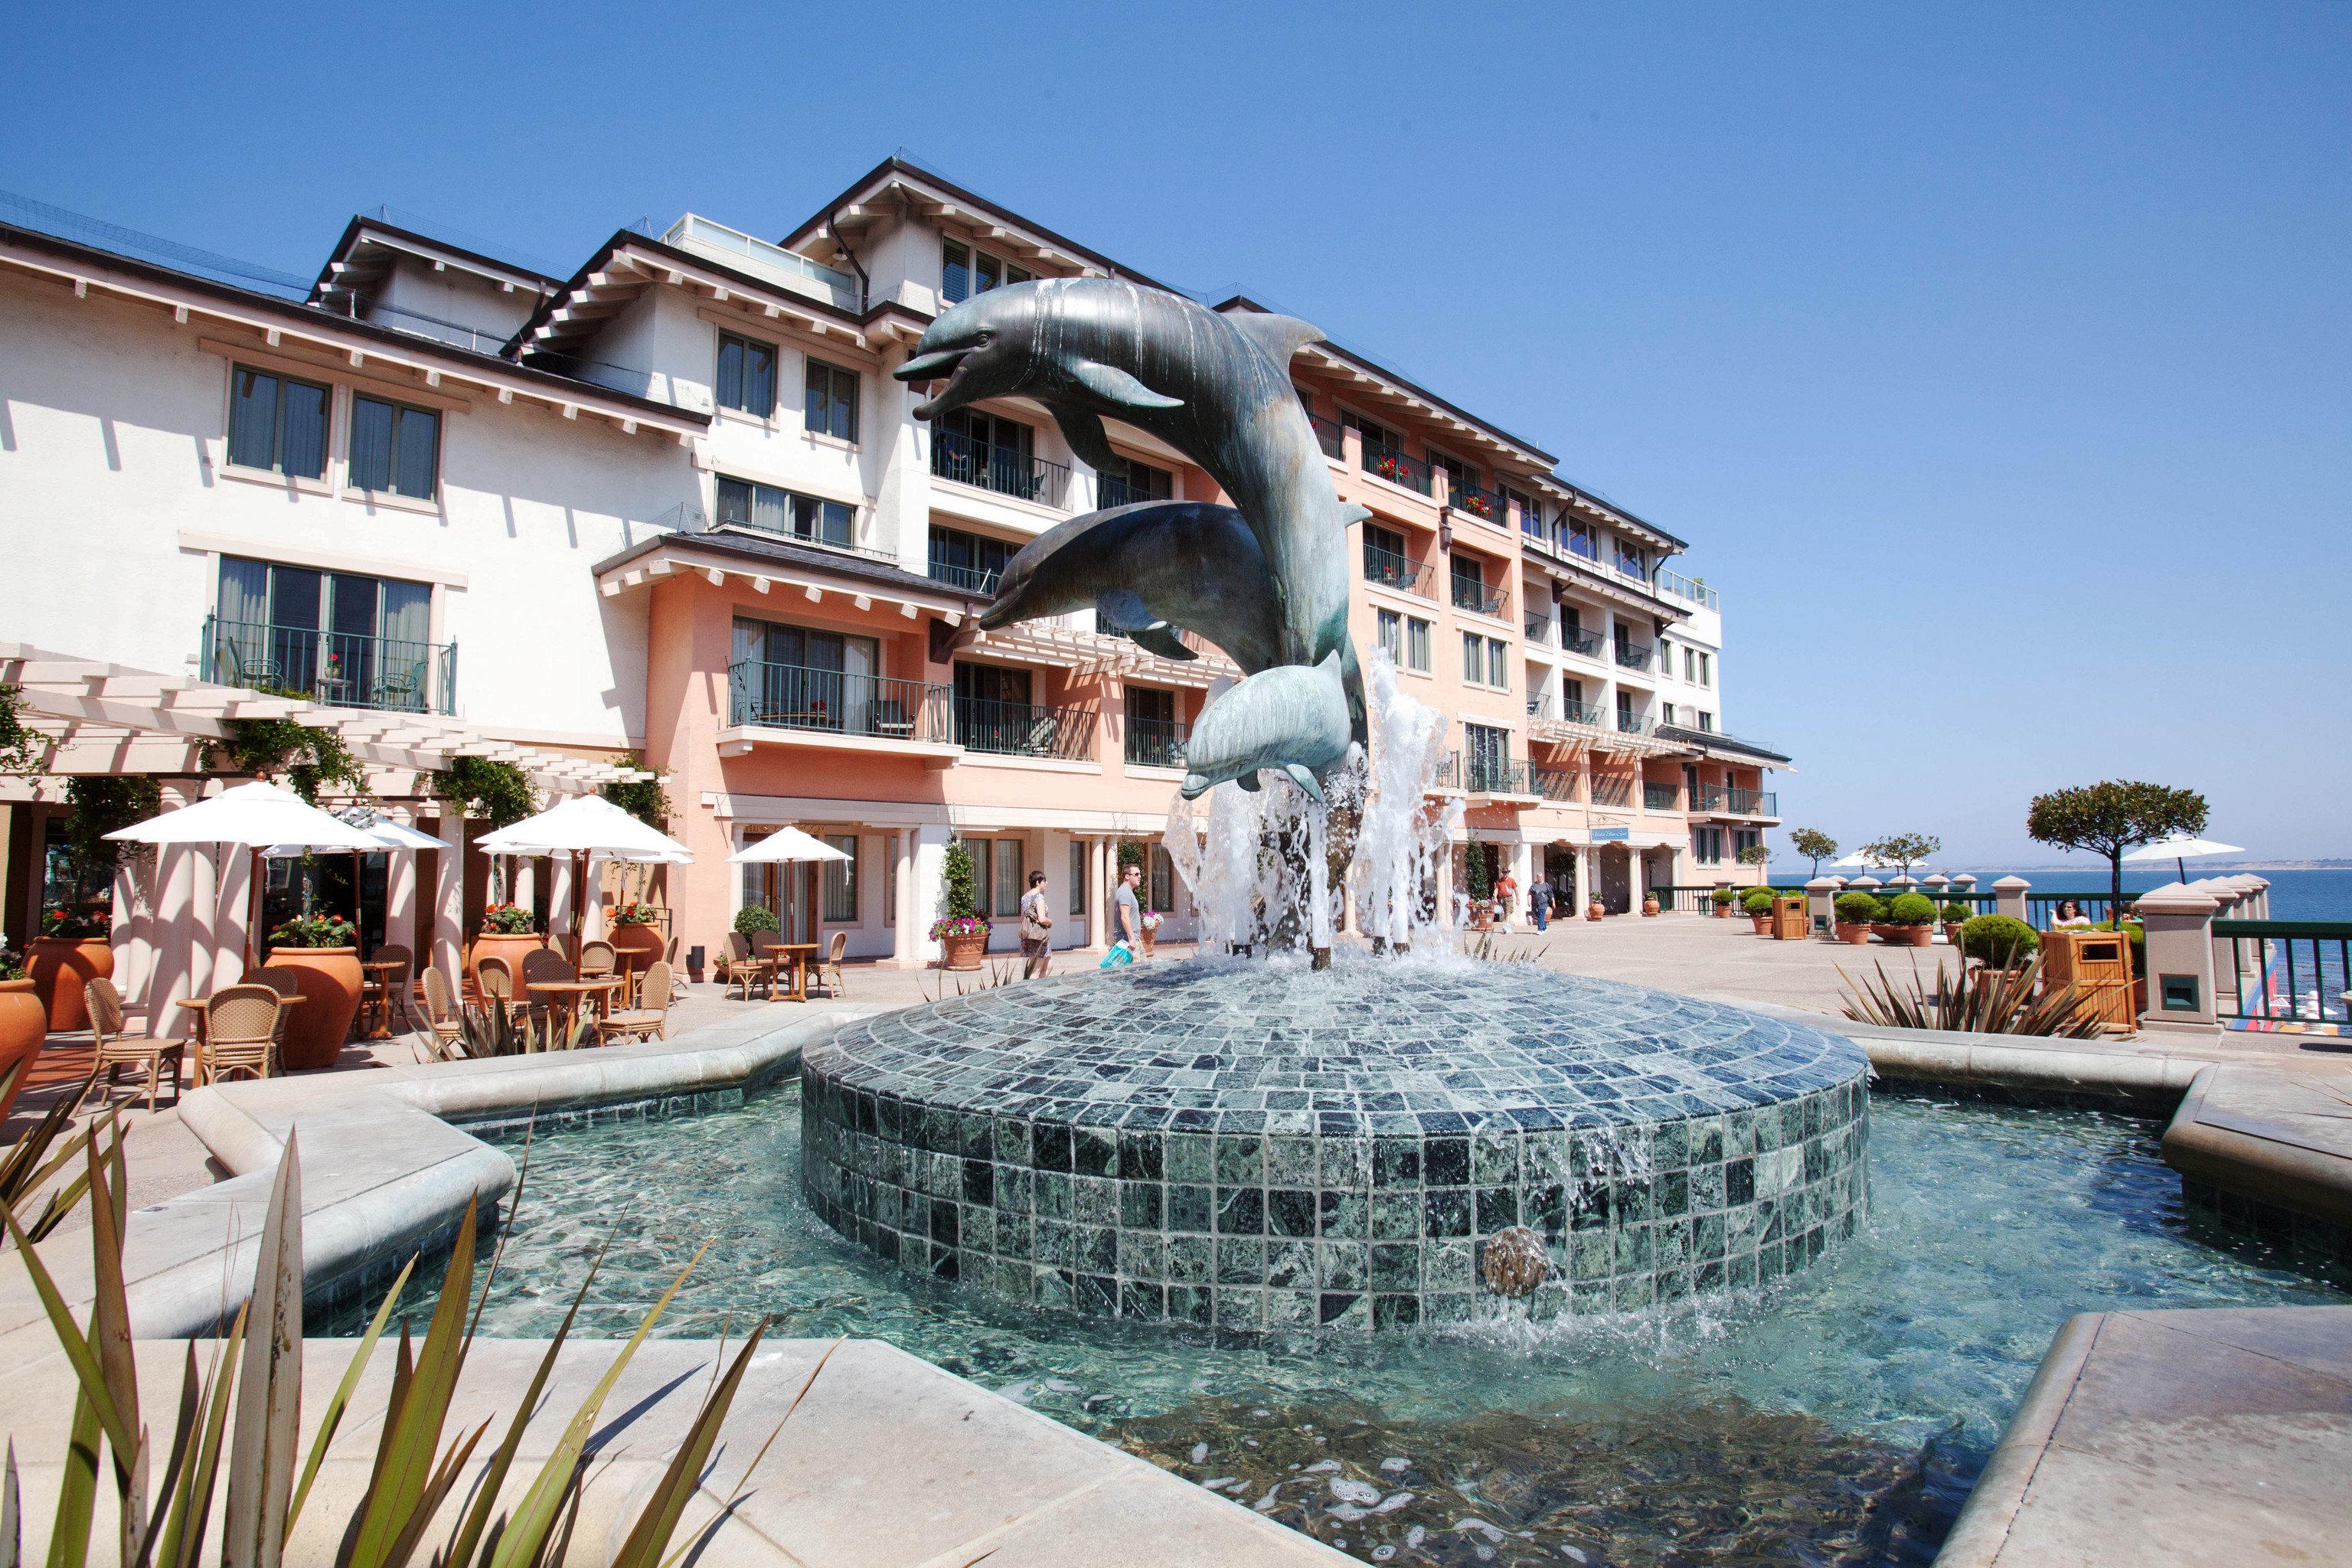 building sky leisure Resort Town house swimming pool plaza marina dock palace condominium lawn Harbor stone